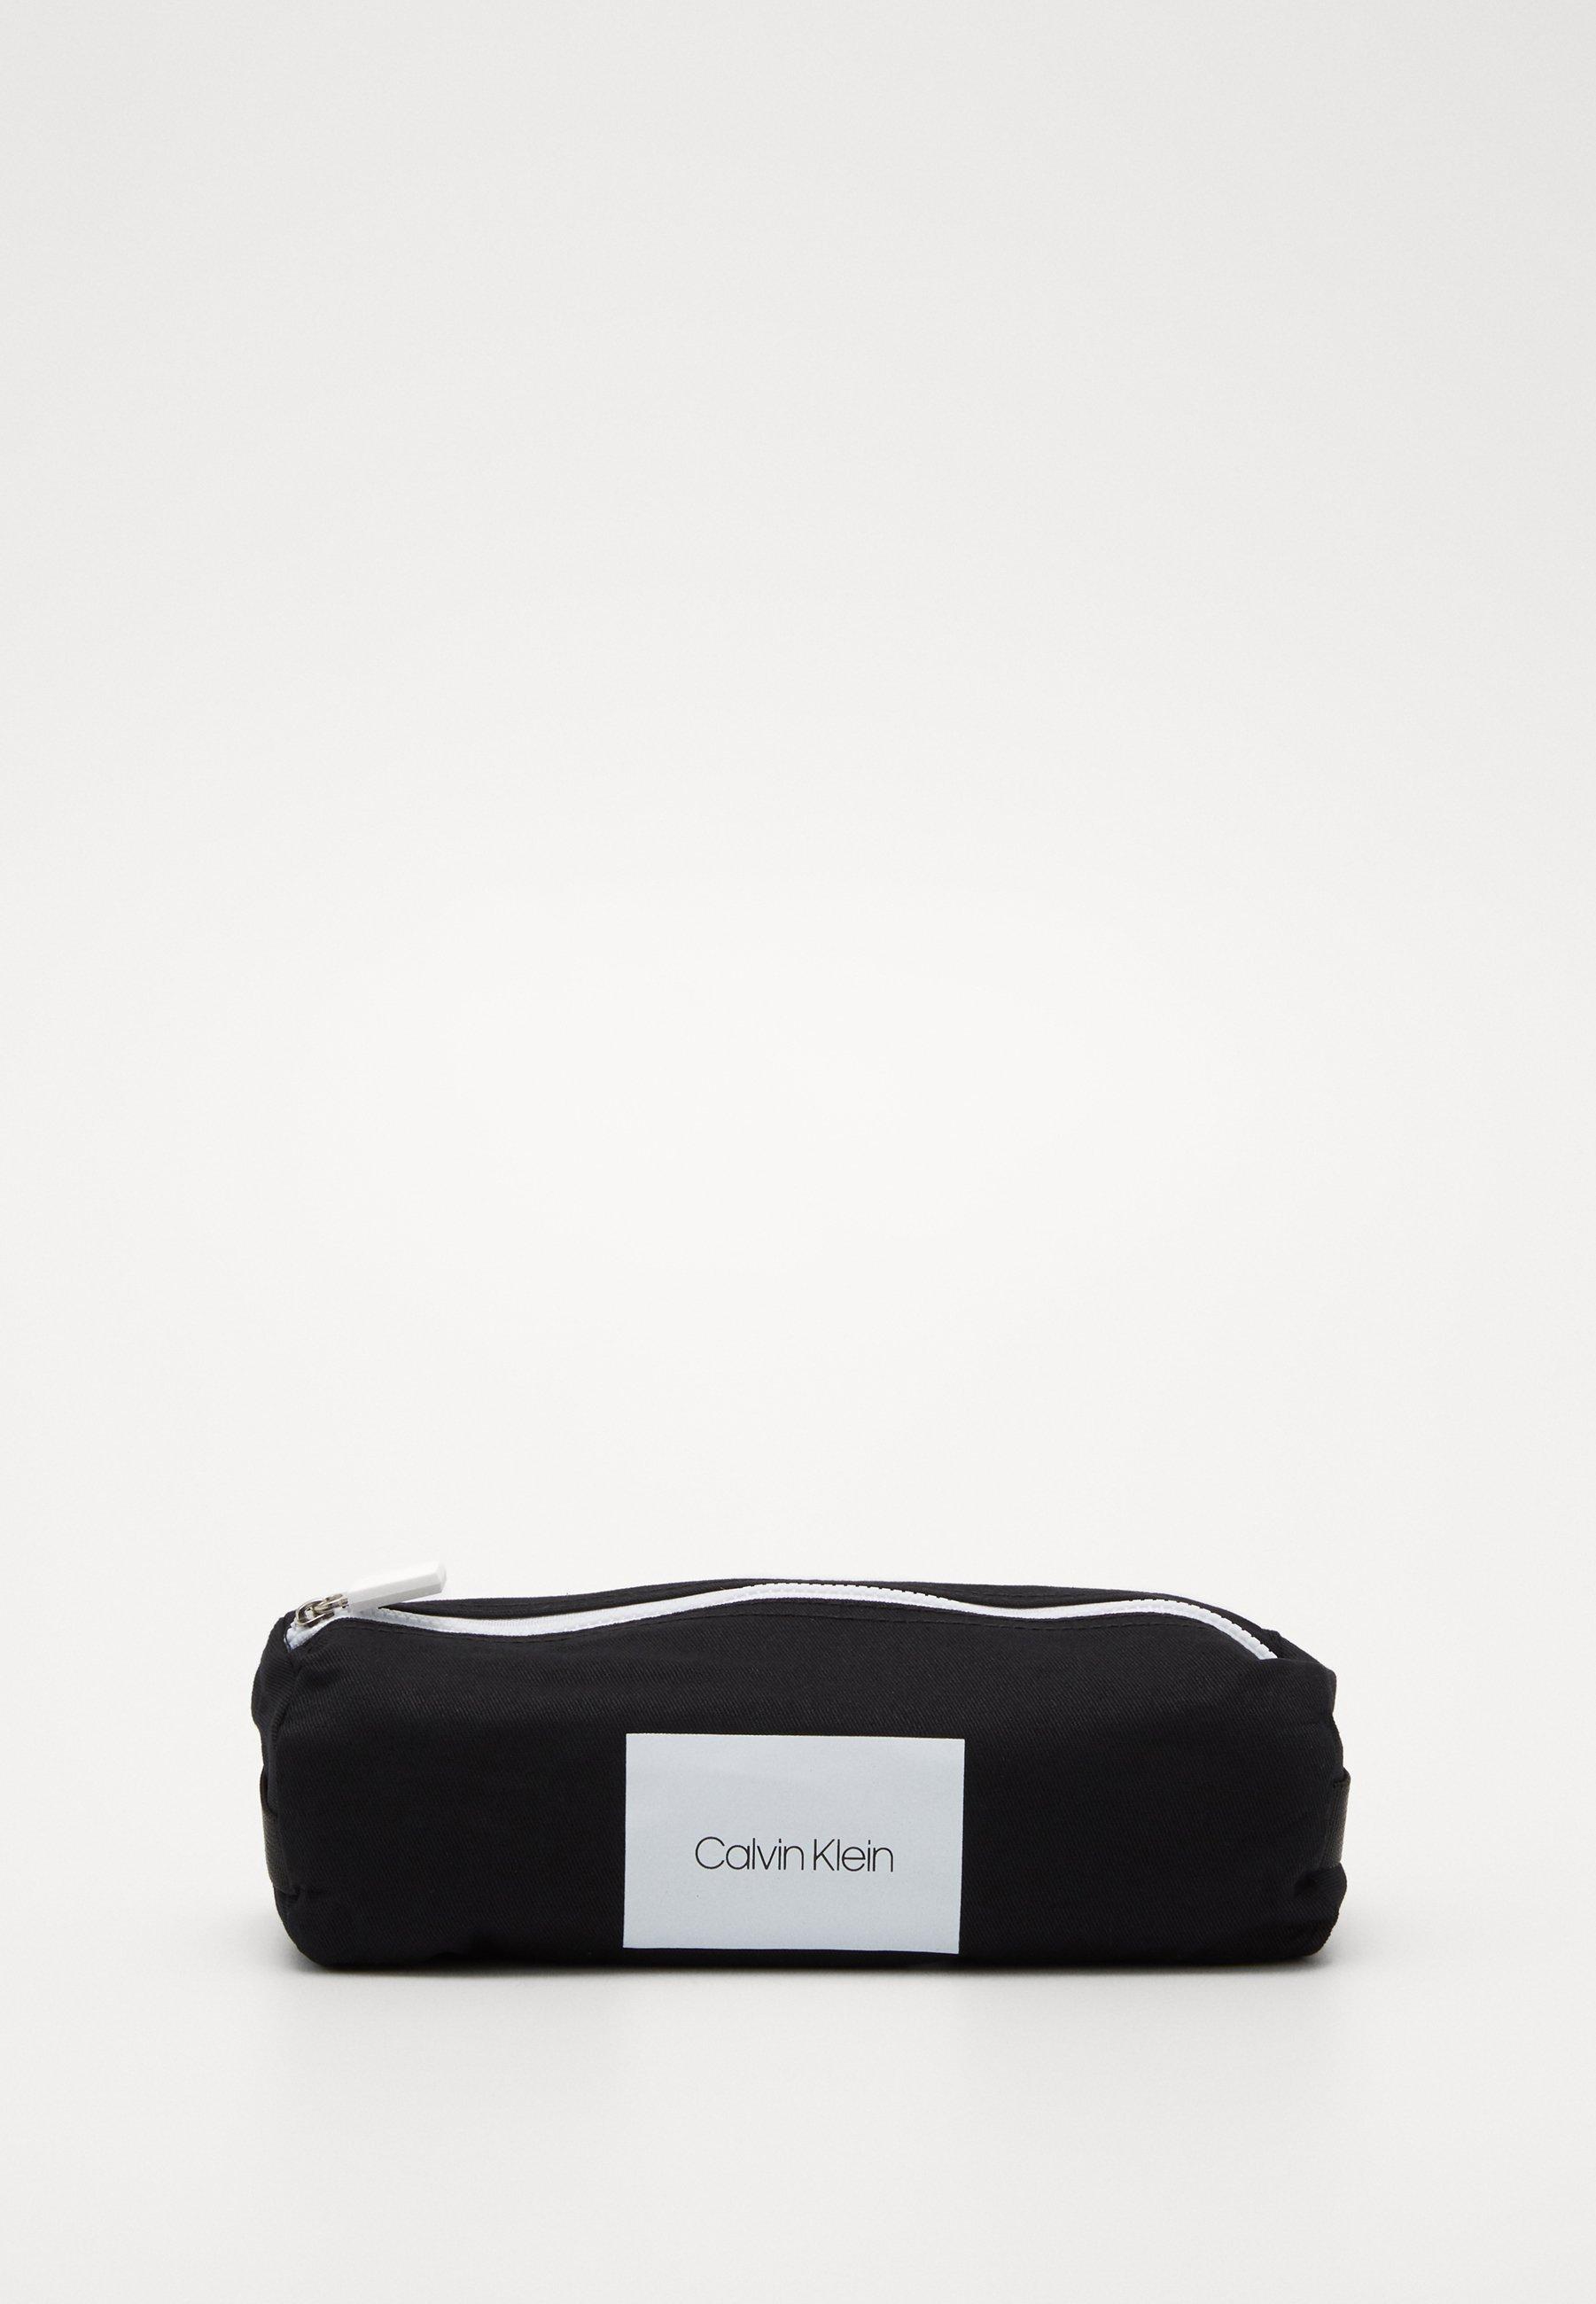 Calvin Klein Underwear Travel Bag 3 Pack - Sokker Grey